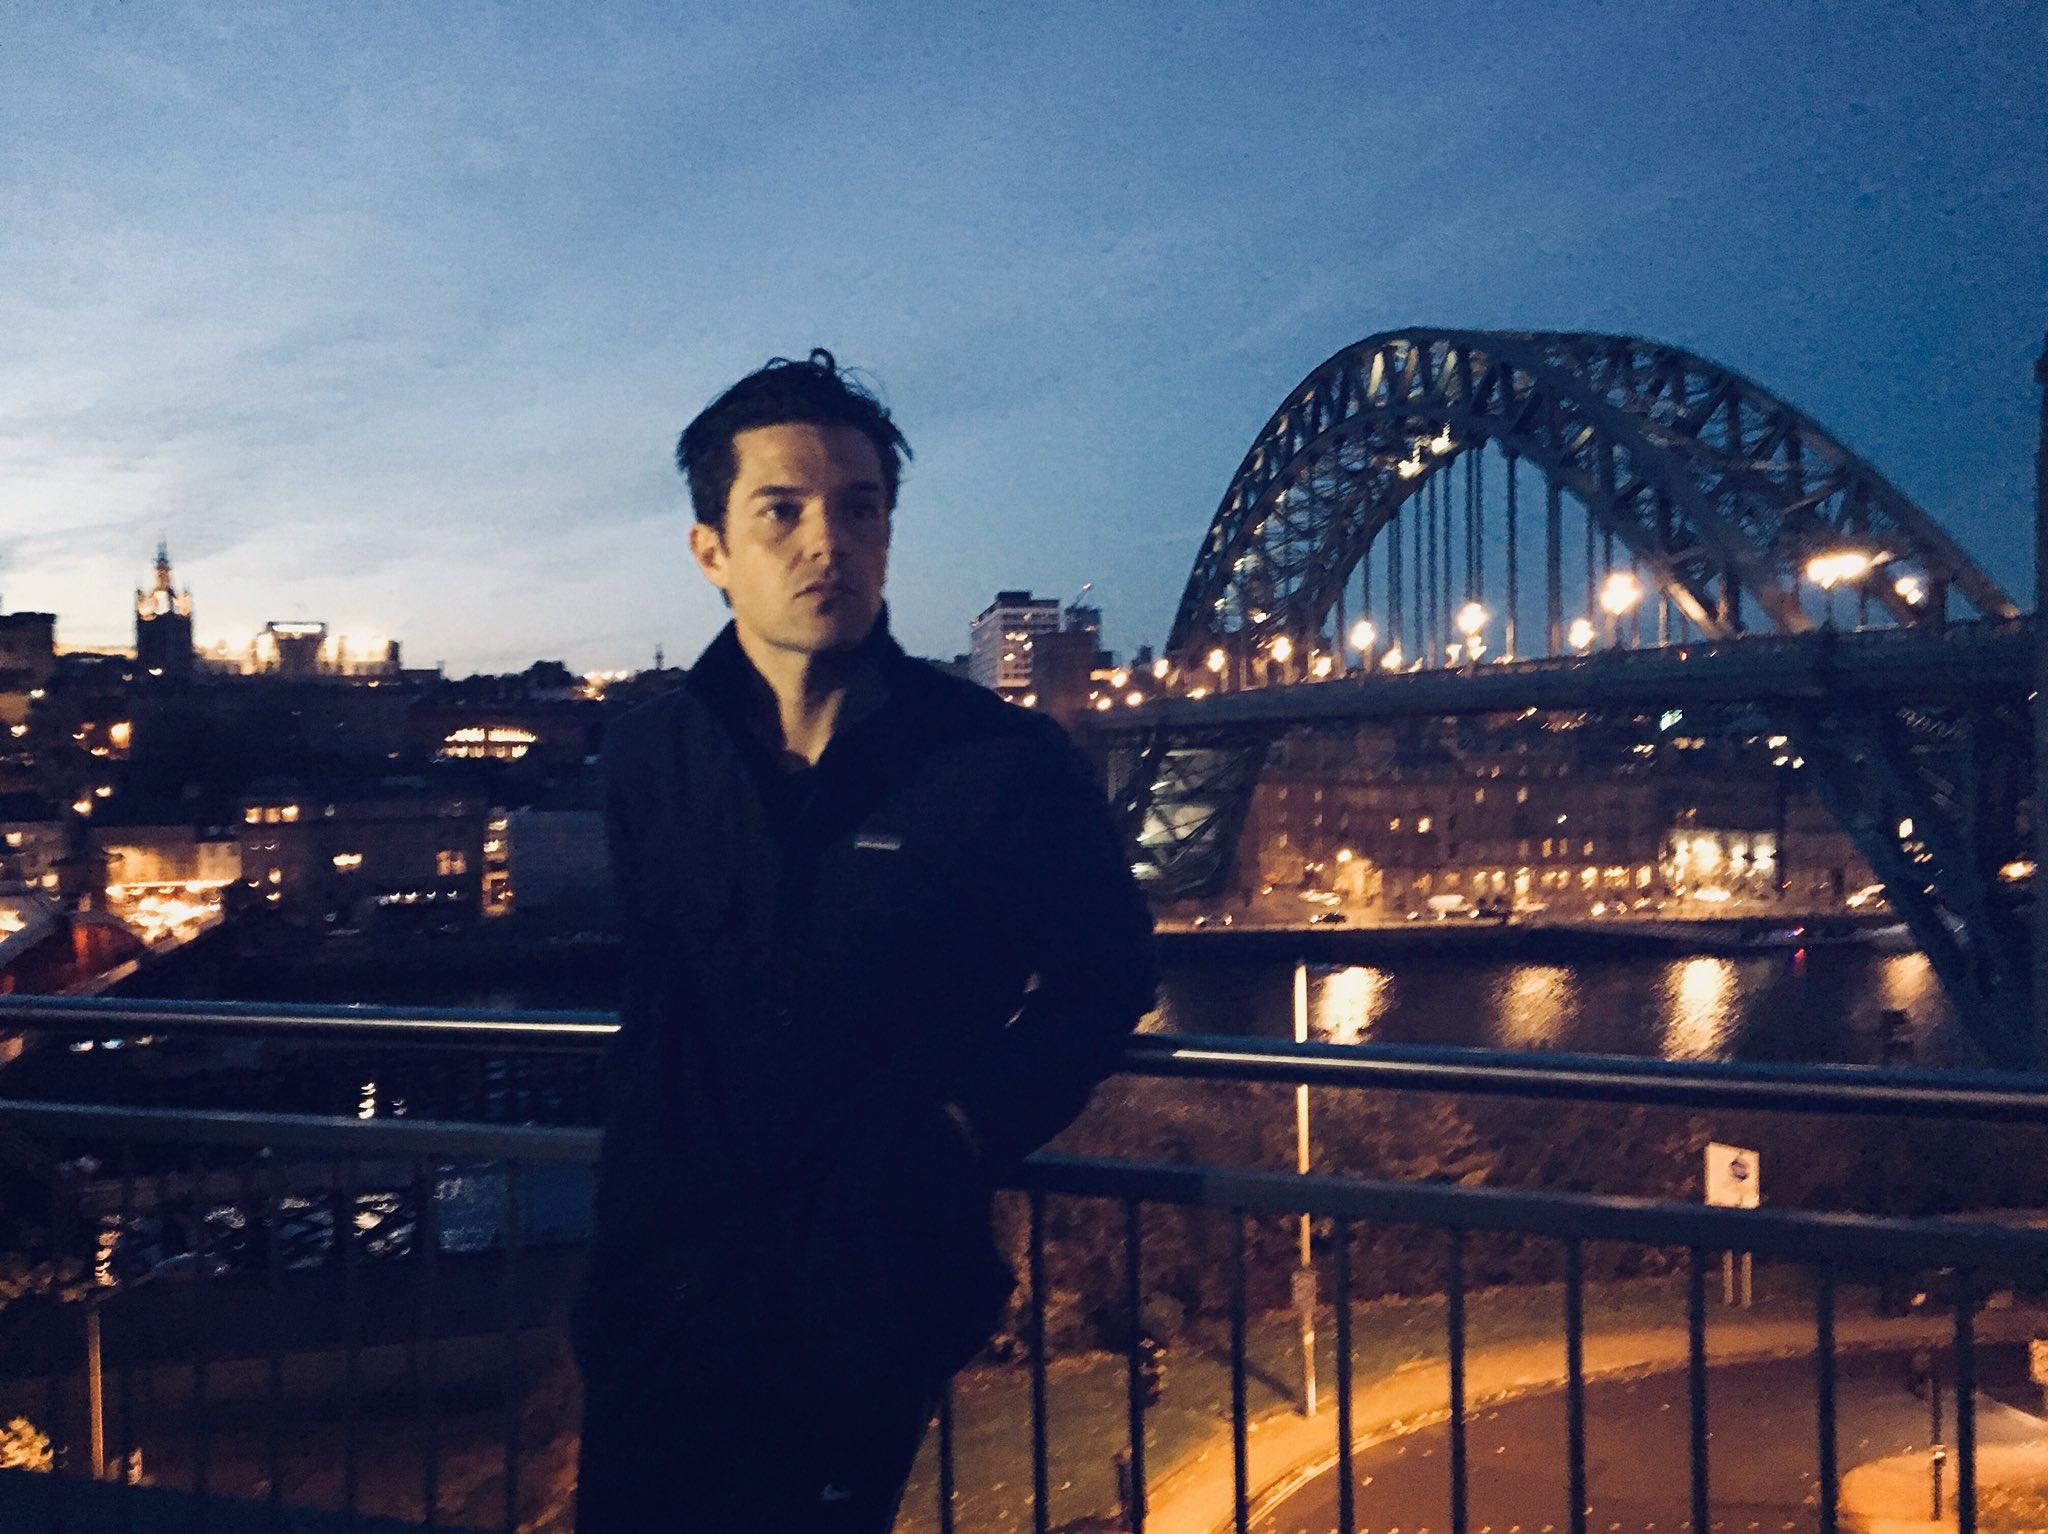 Newcastle...it's Tyne. #whyayeman https://t.co/qp4xE1qlWn